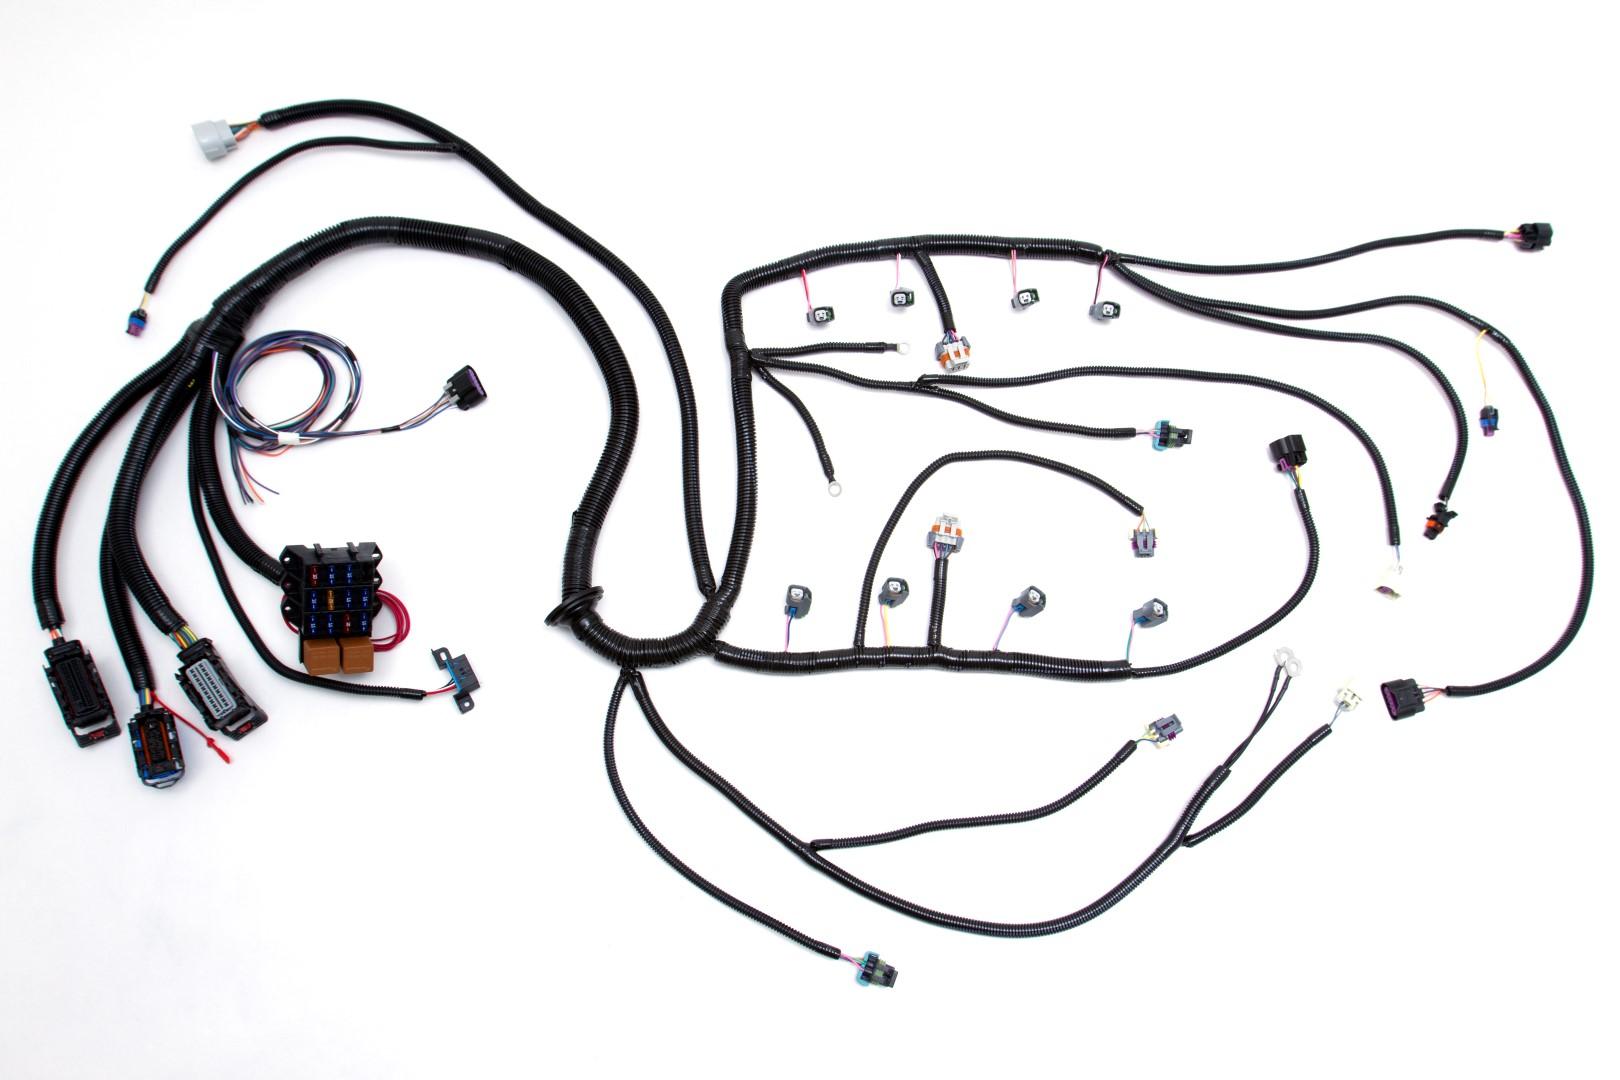 c3 corvette custom wiring harness